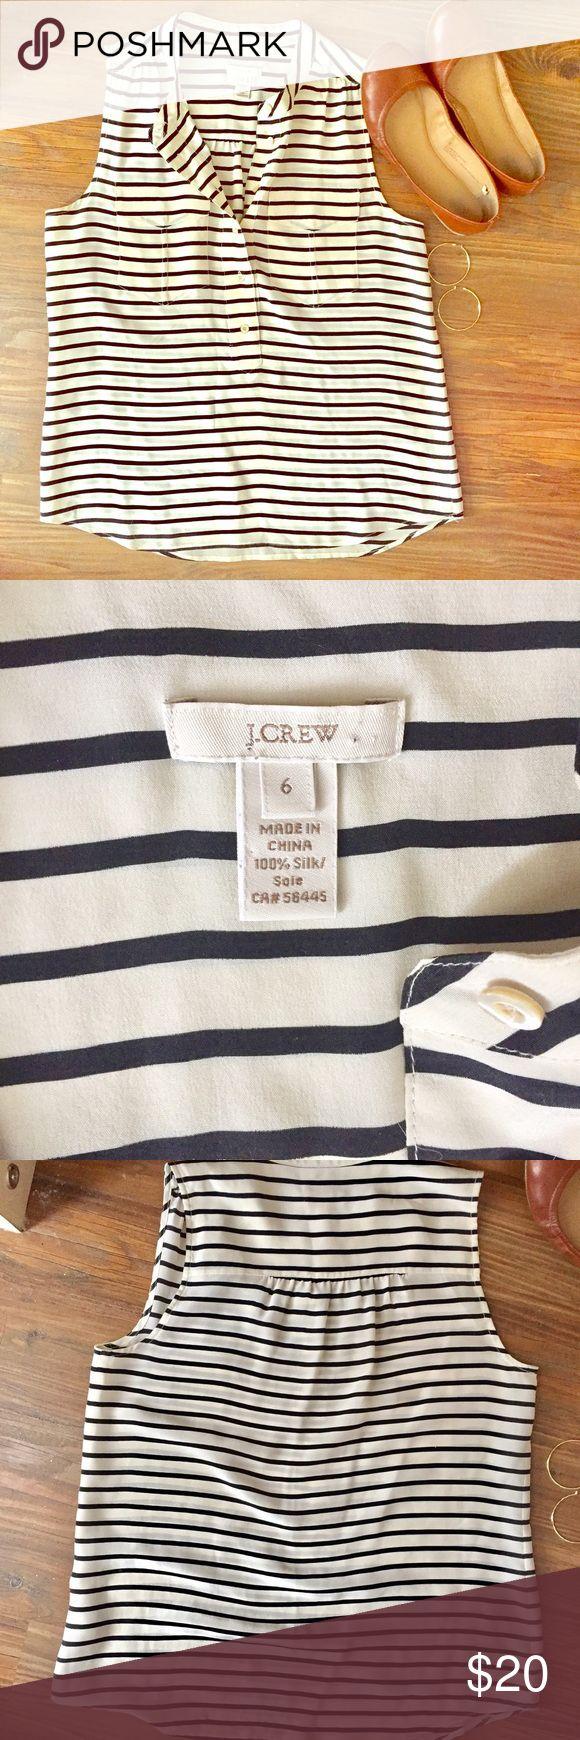 J.Crew Striped Tank Worn once. Black/cream striped tank. Cute button and pocket detailing. 100% silk. J. Crew Tops Tank Tops